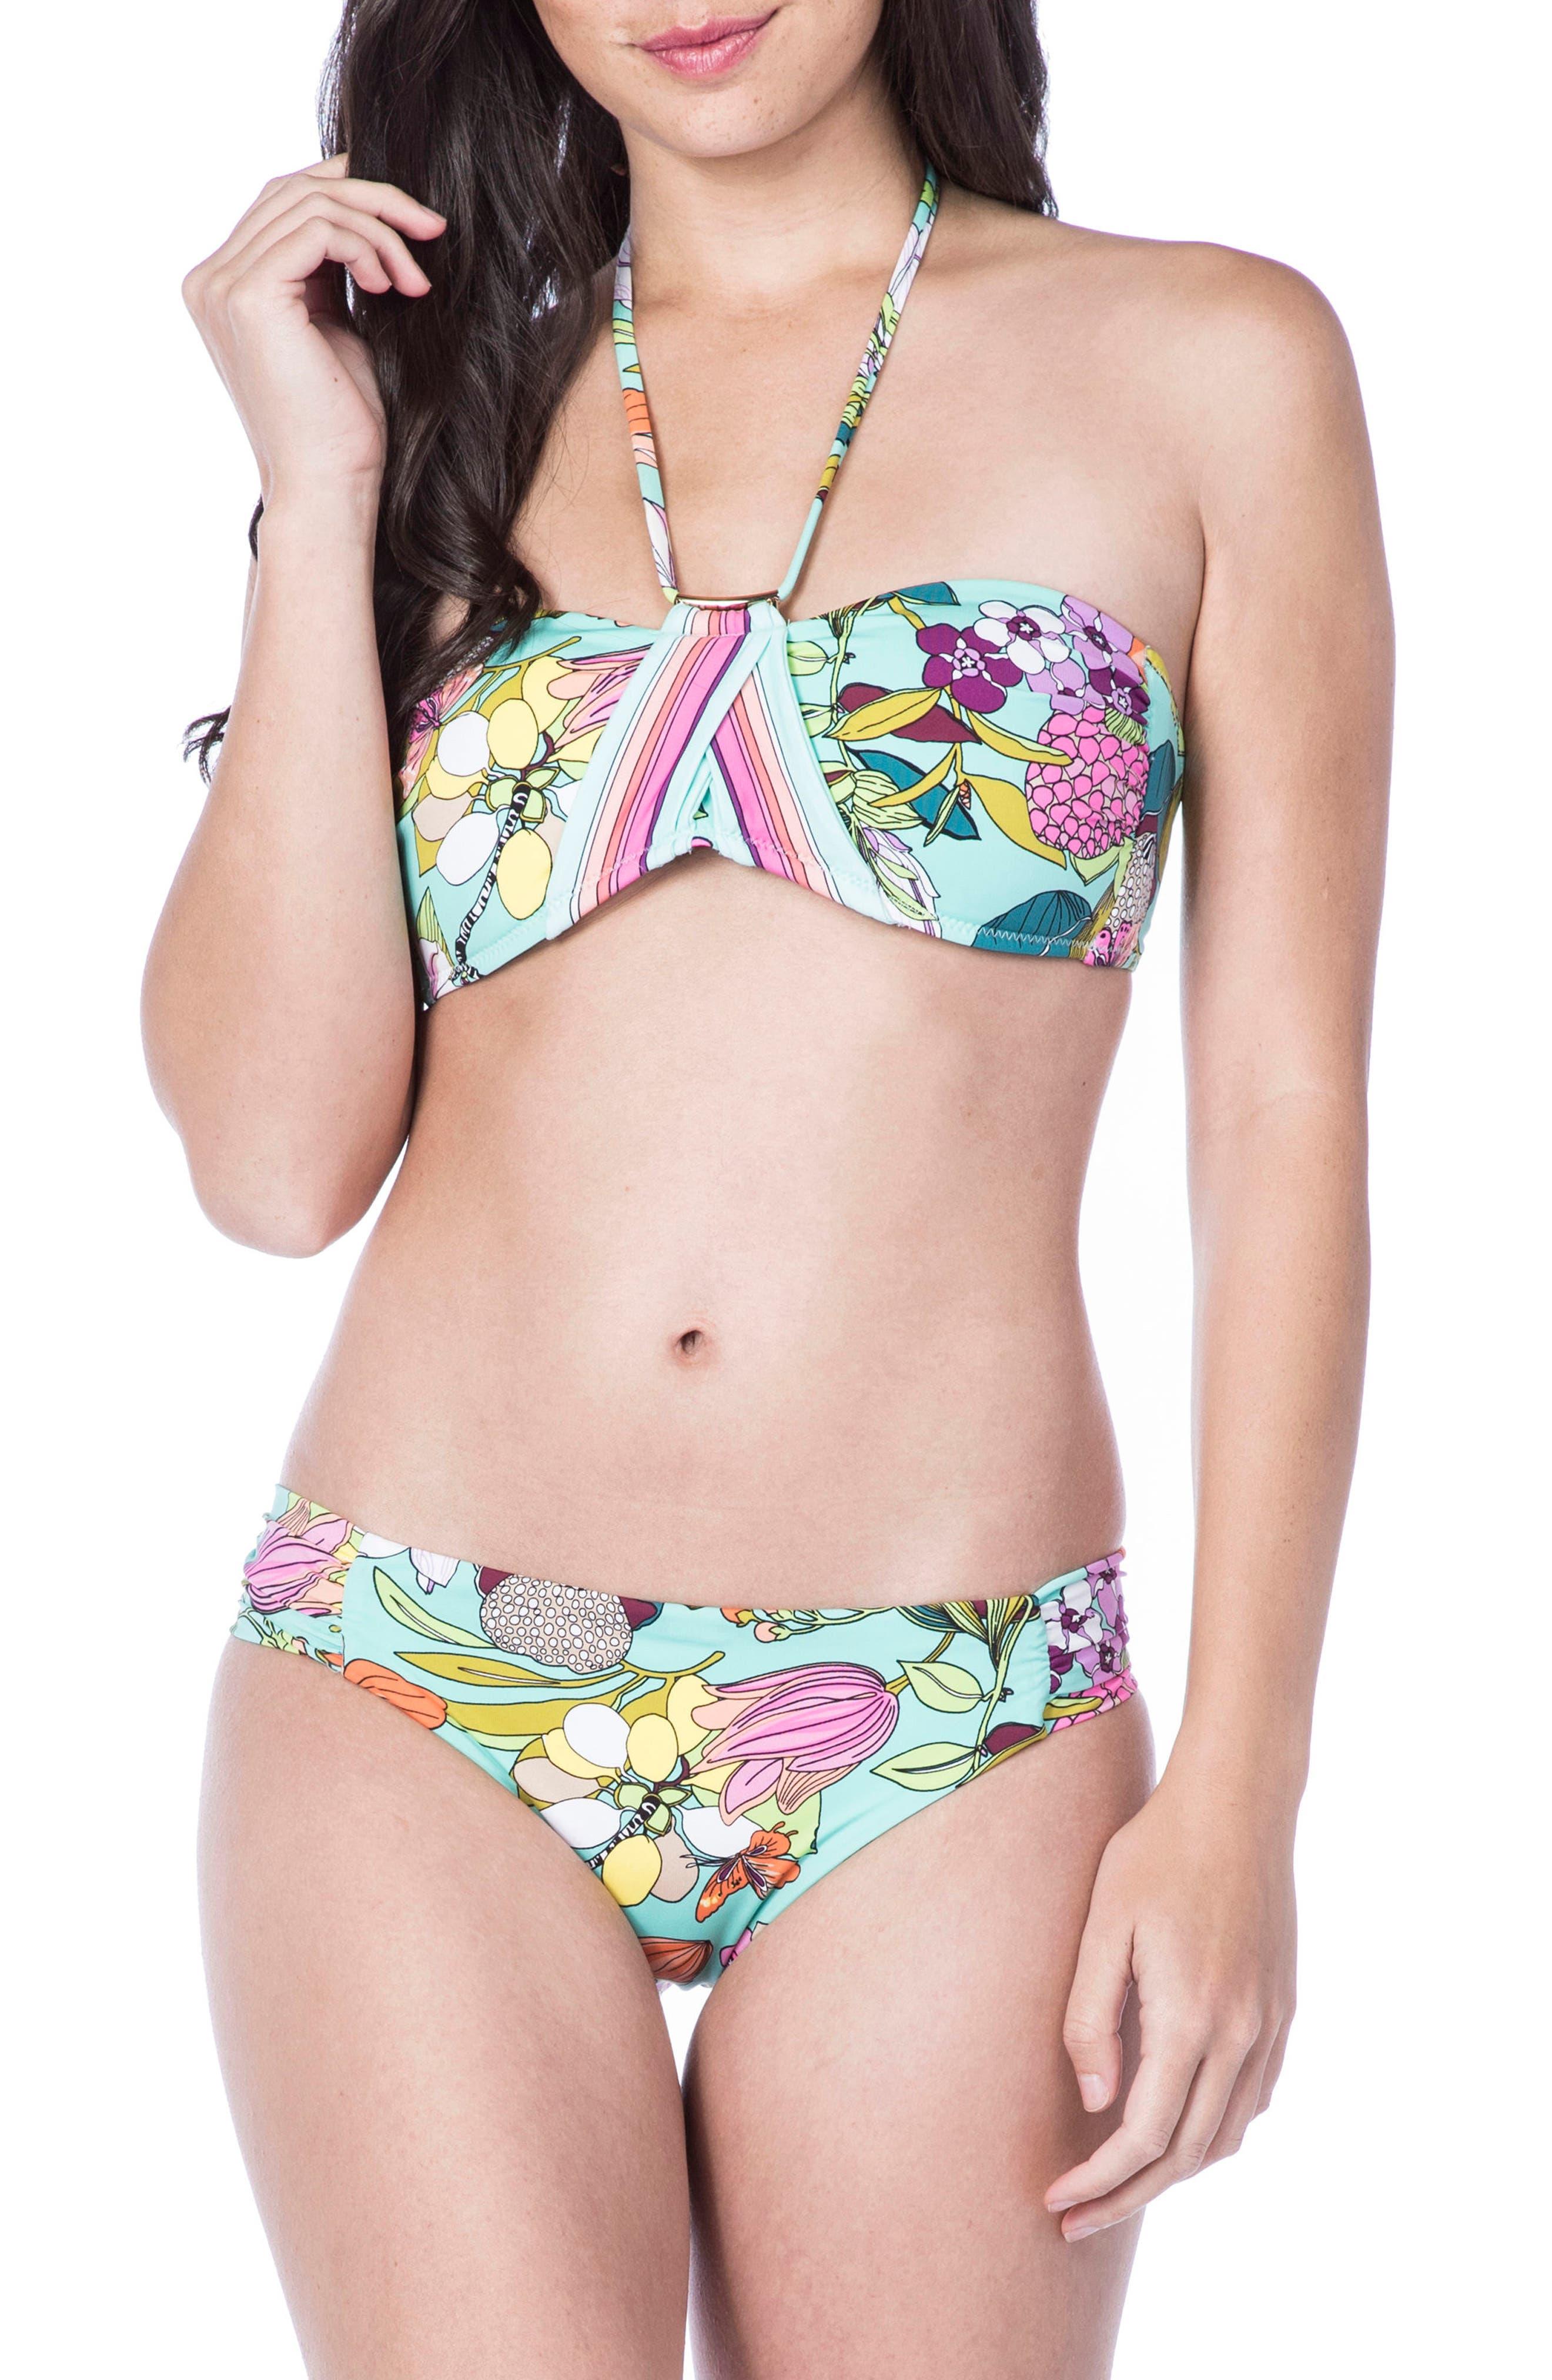 Key West Bandeau Bikini Top,                             Alternate thumbnail 3, color,                             Aqua